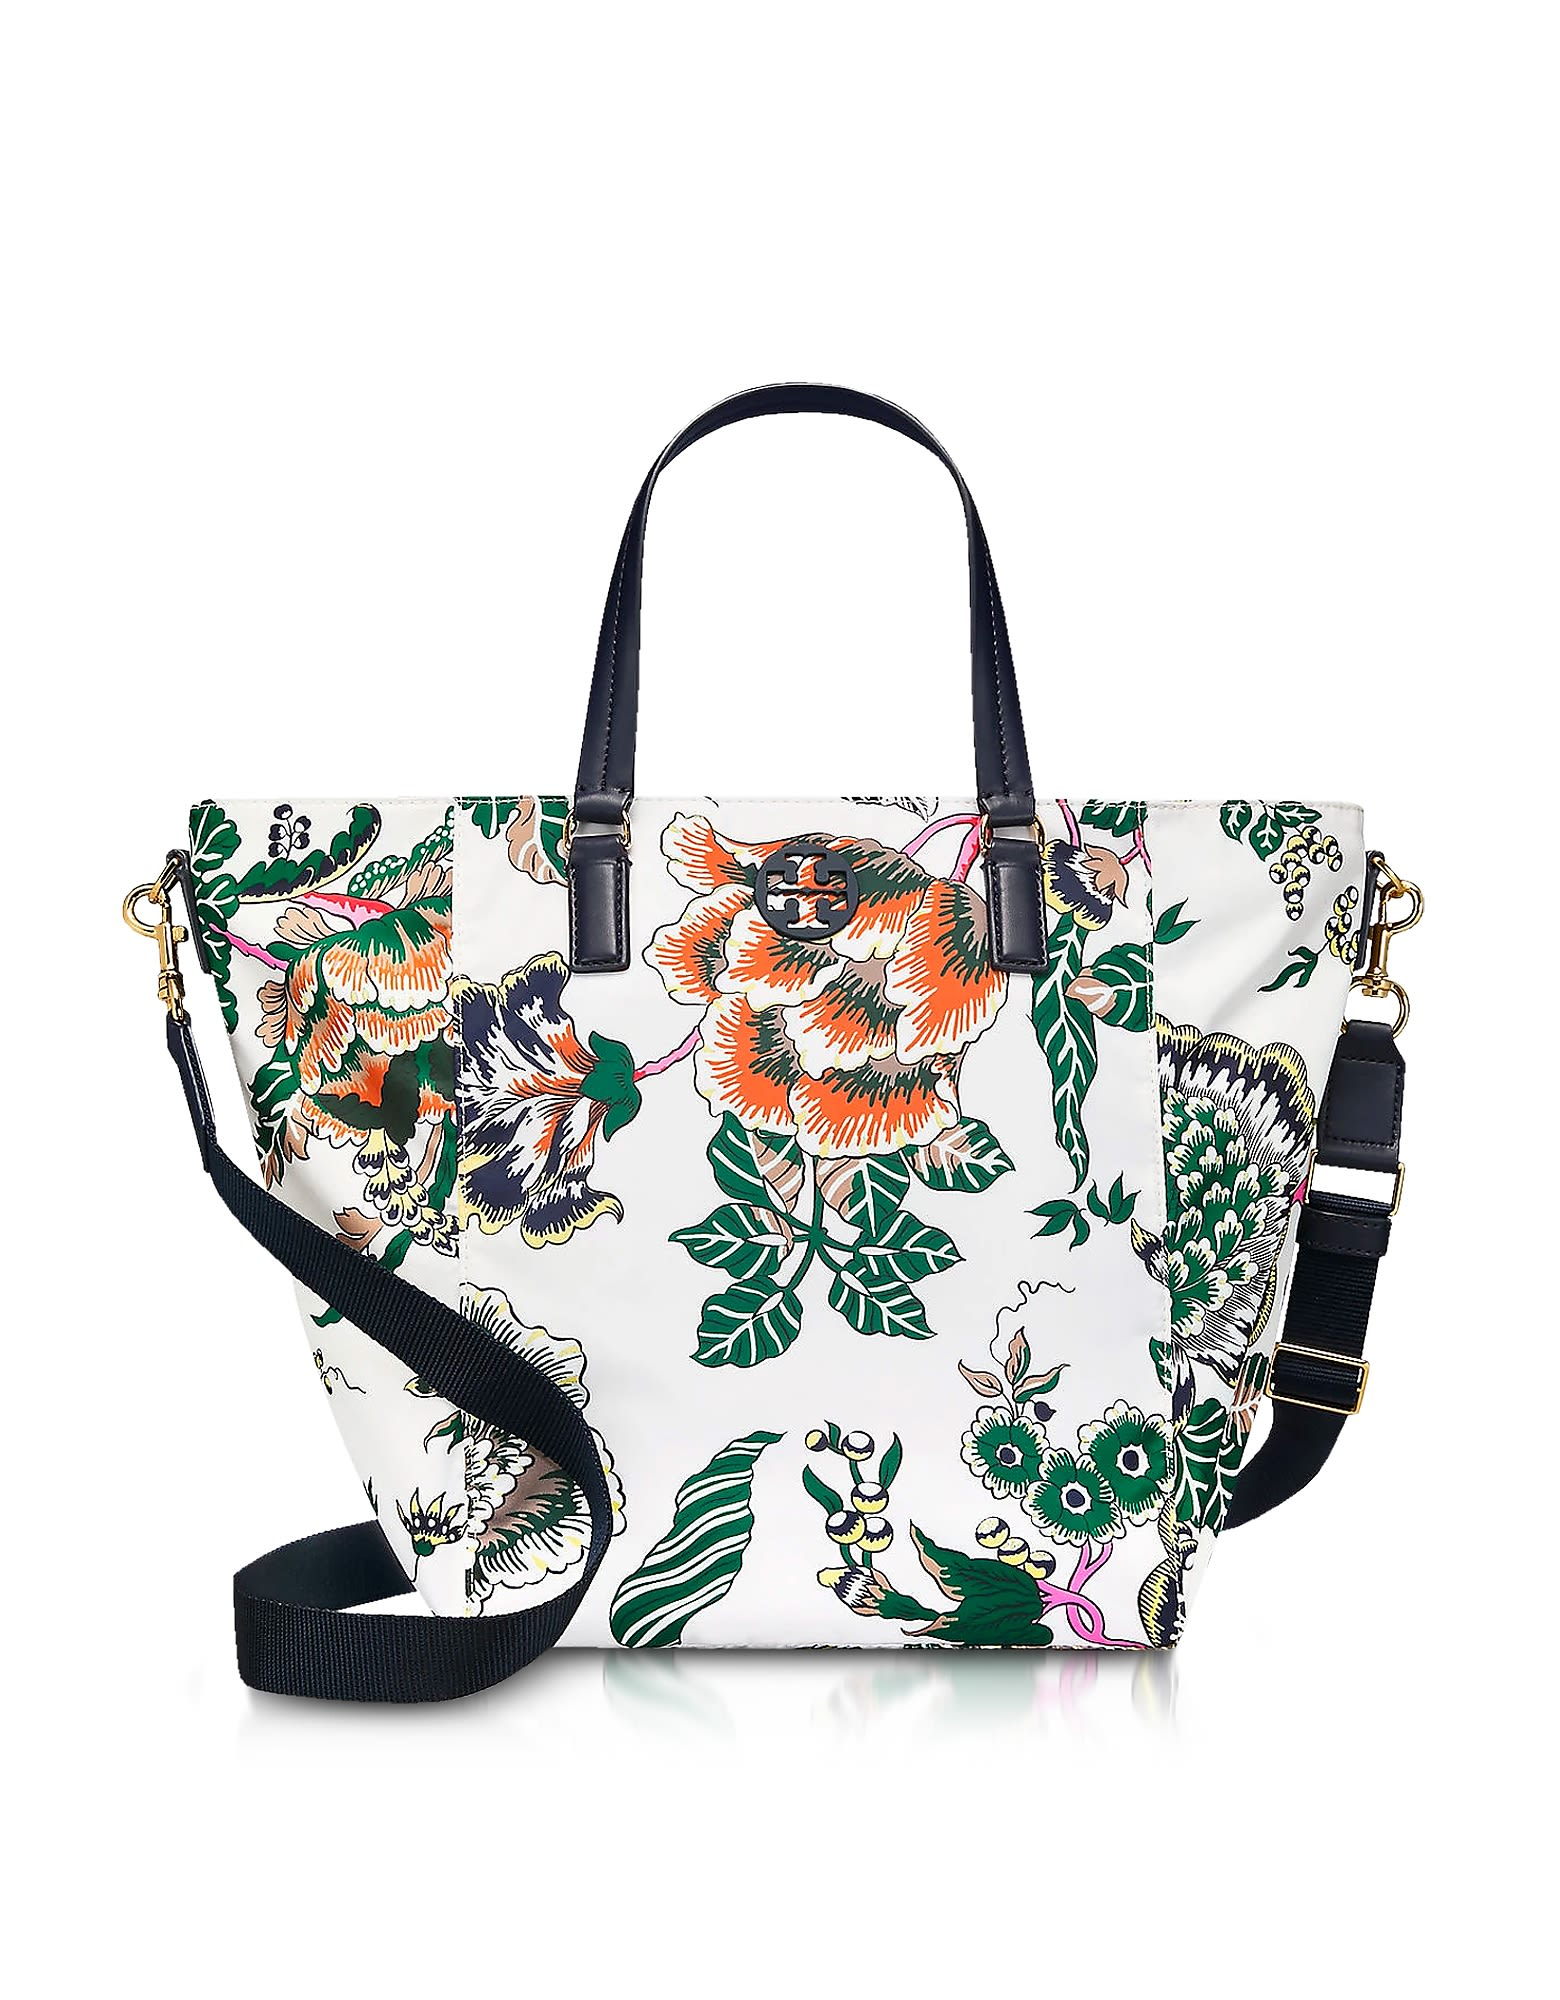 Tilda Ivory Happy Times Printed Nylon Small Tote Bag